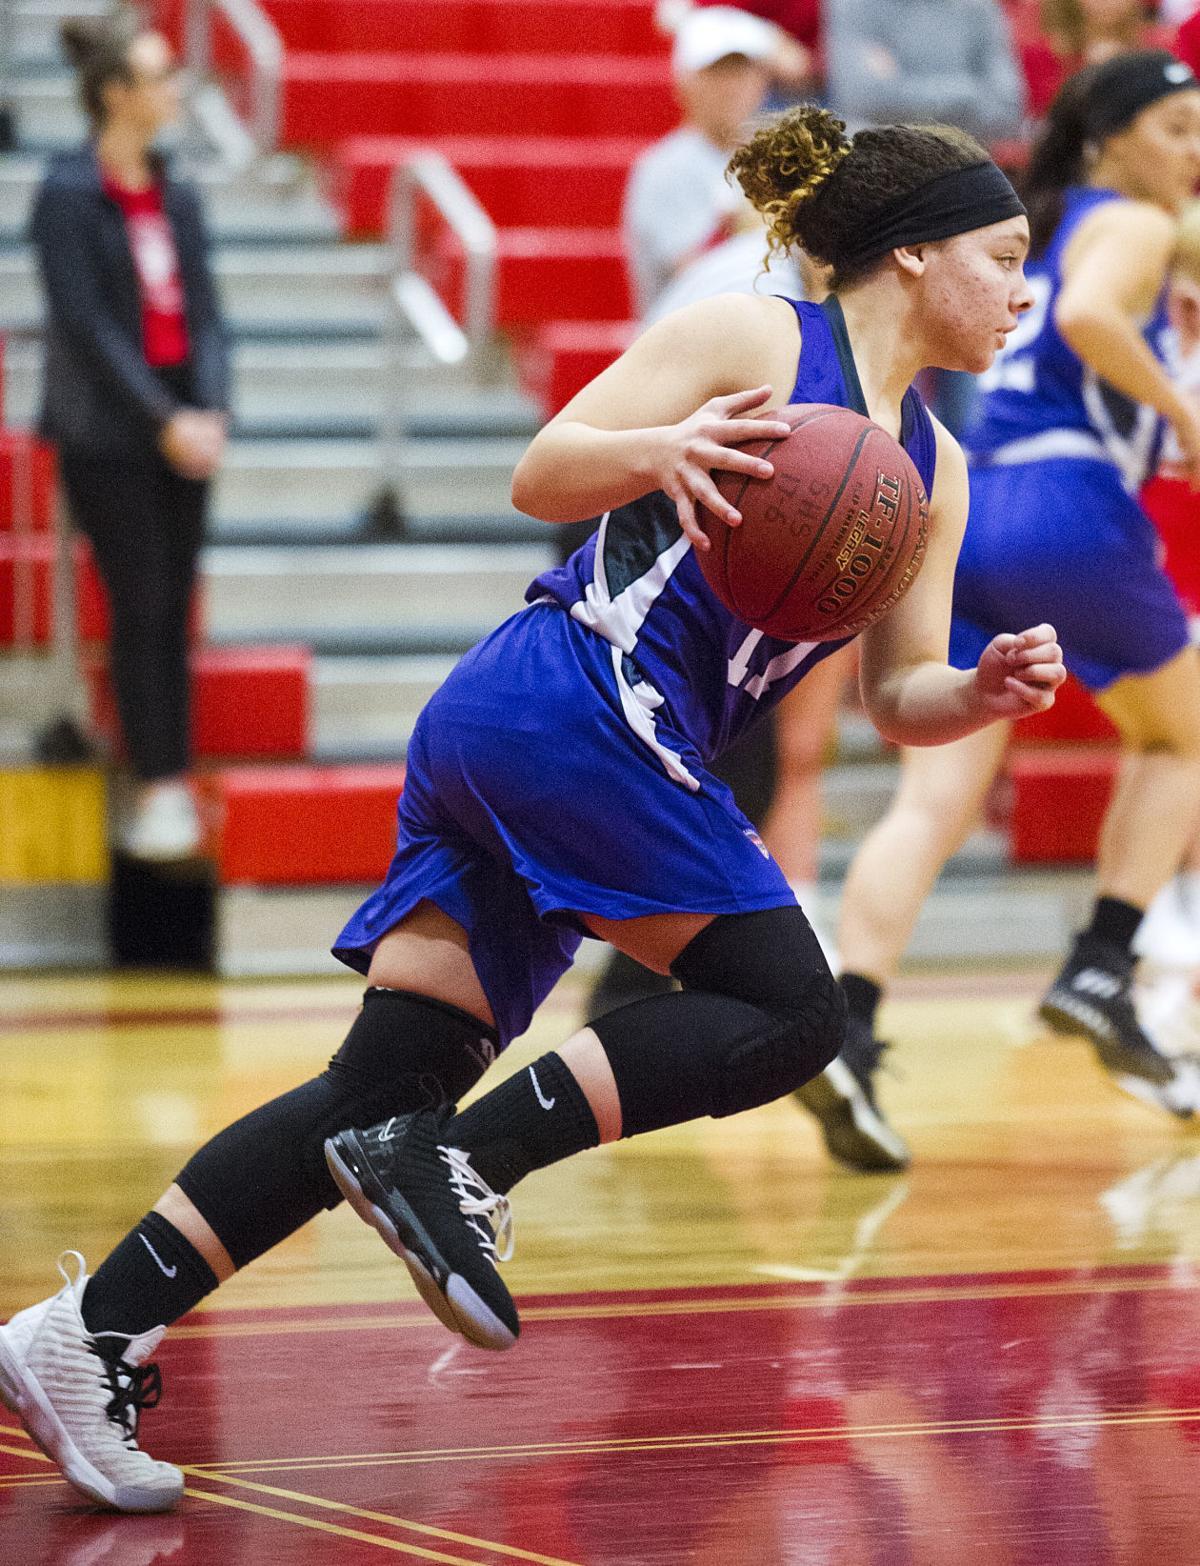 Girls basketball: Anacortes at Stanwood, 12.3.19